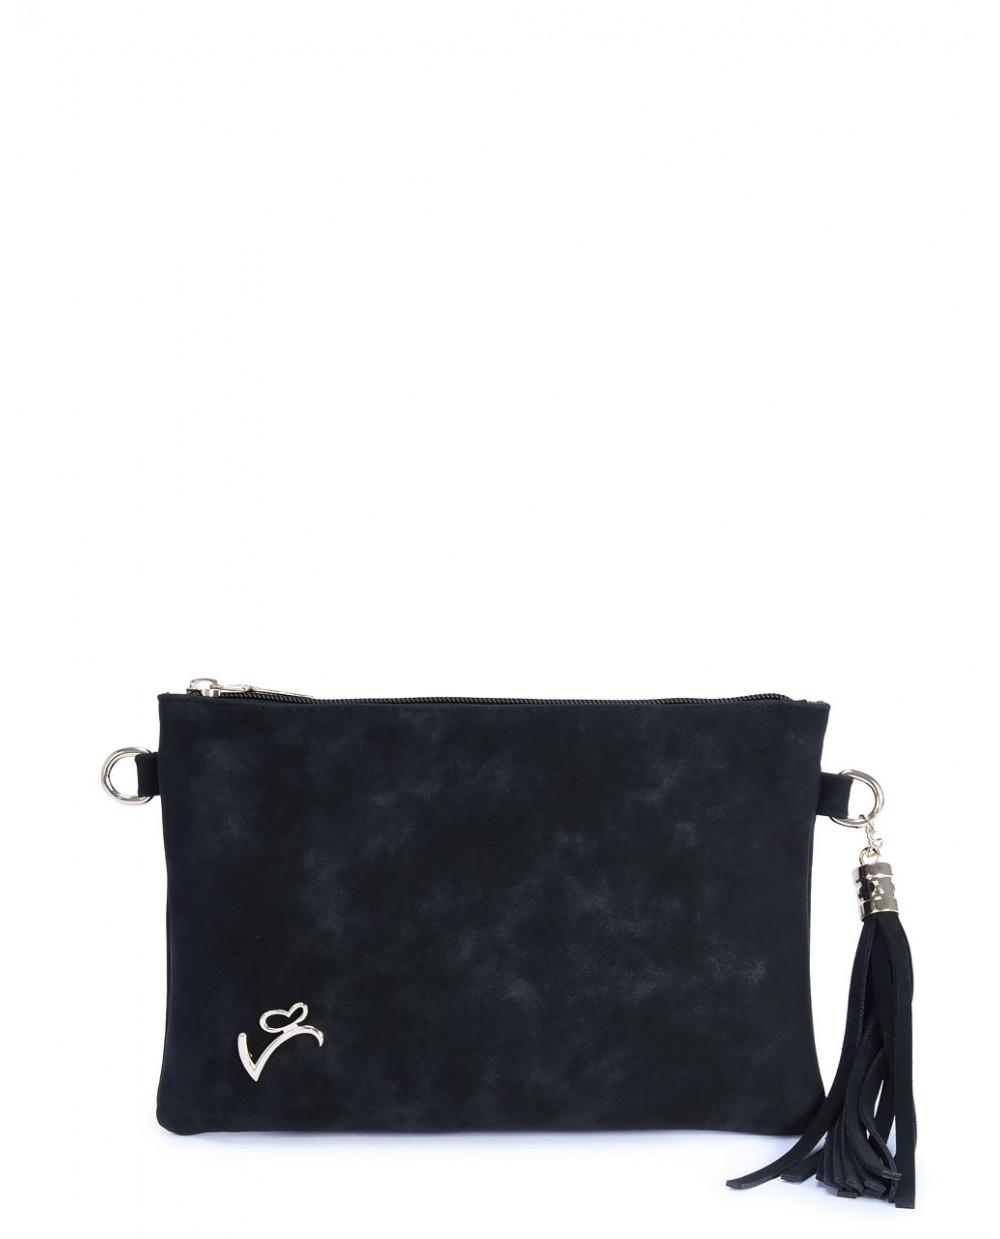 b372baa45f Touch-accessories Τσάντα χιαστή μαύρη VETA δερματίνη 999-1